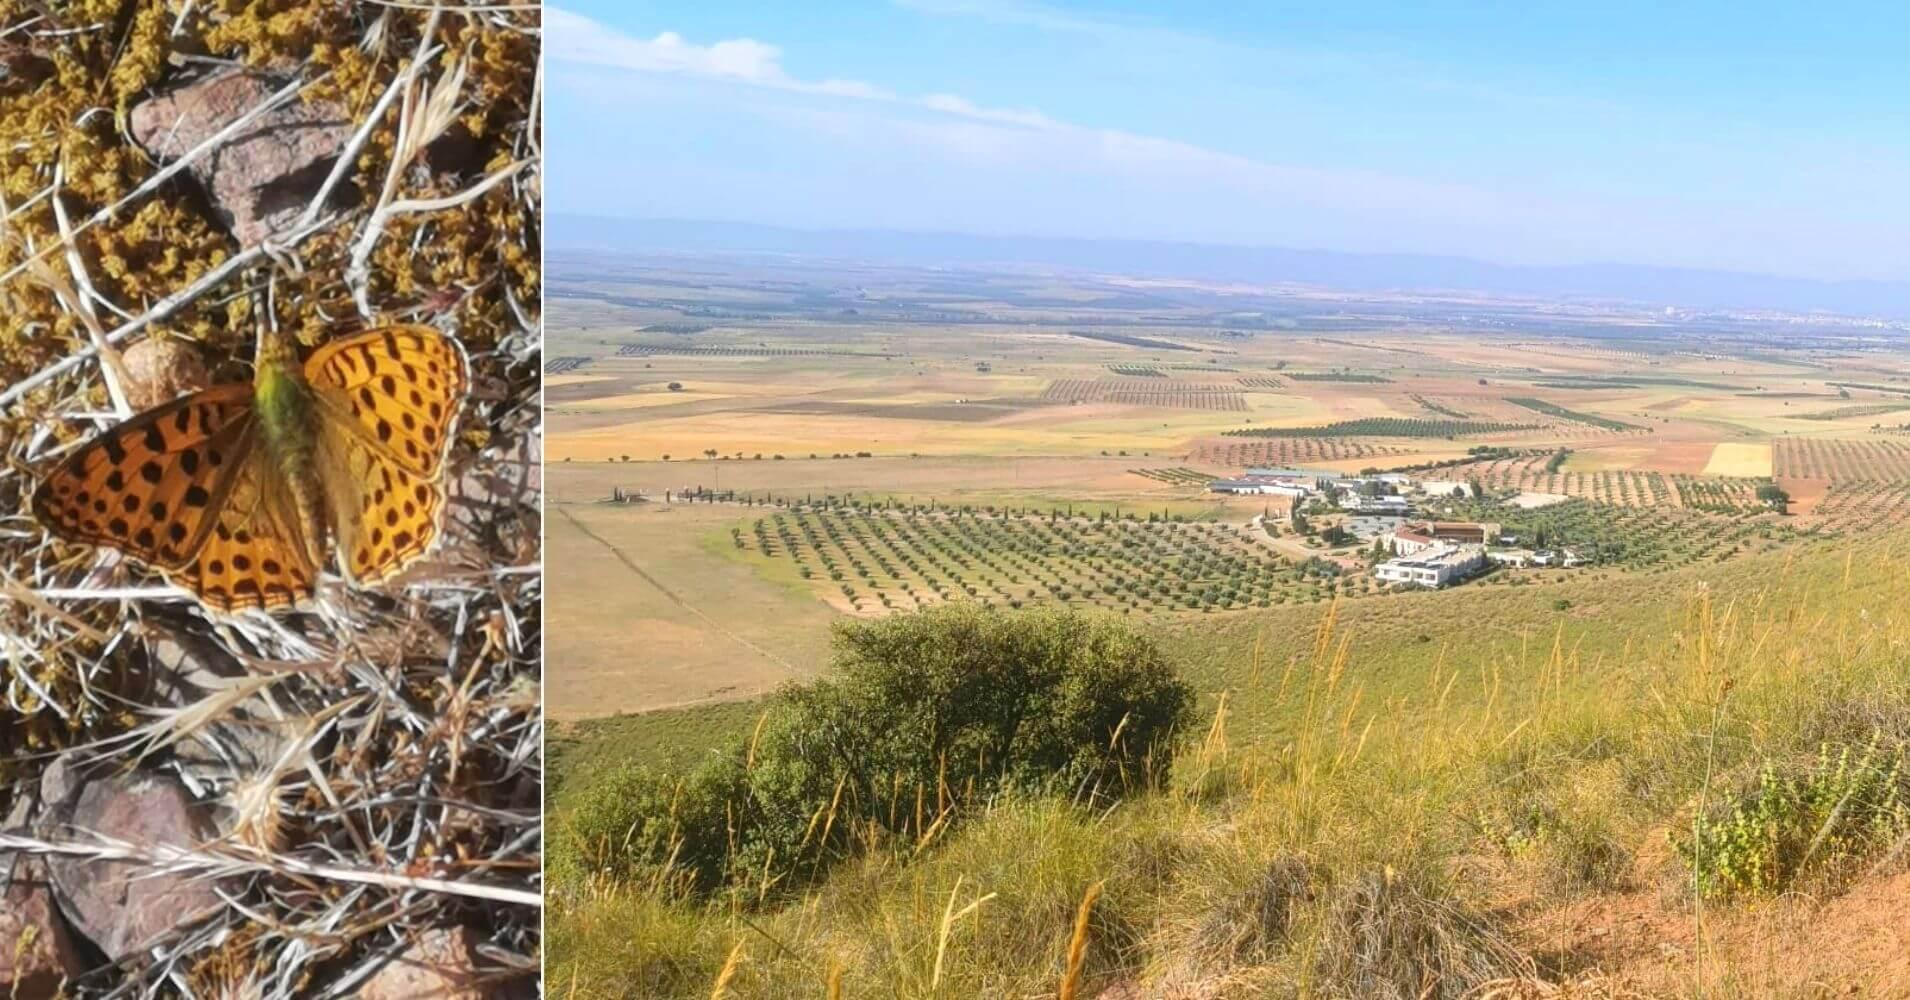 Mariposa y Subida a la Sierra de la Oliva. Almonacid de Toledo, Castilla la Mancha.